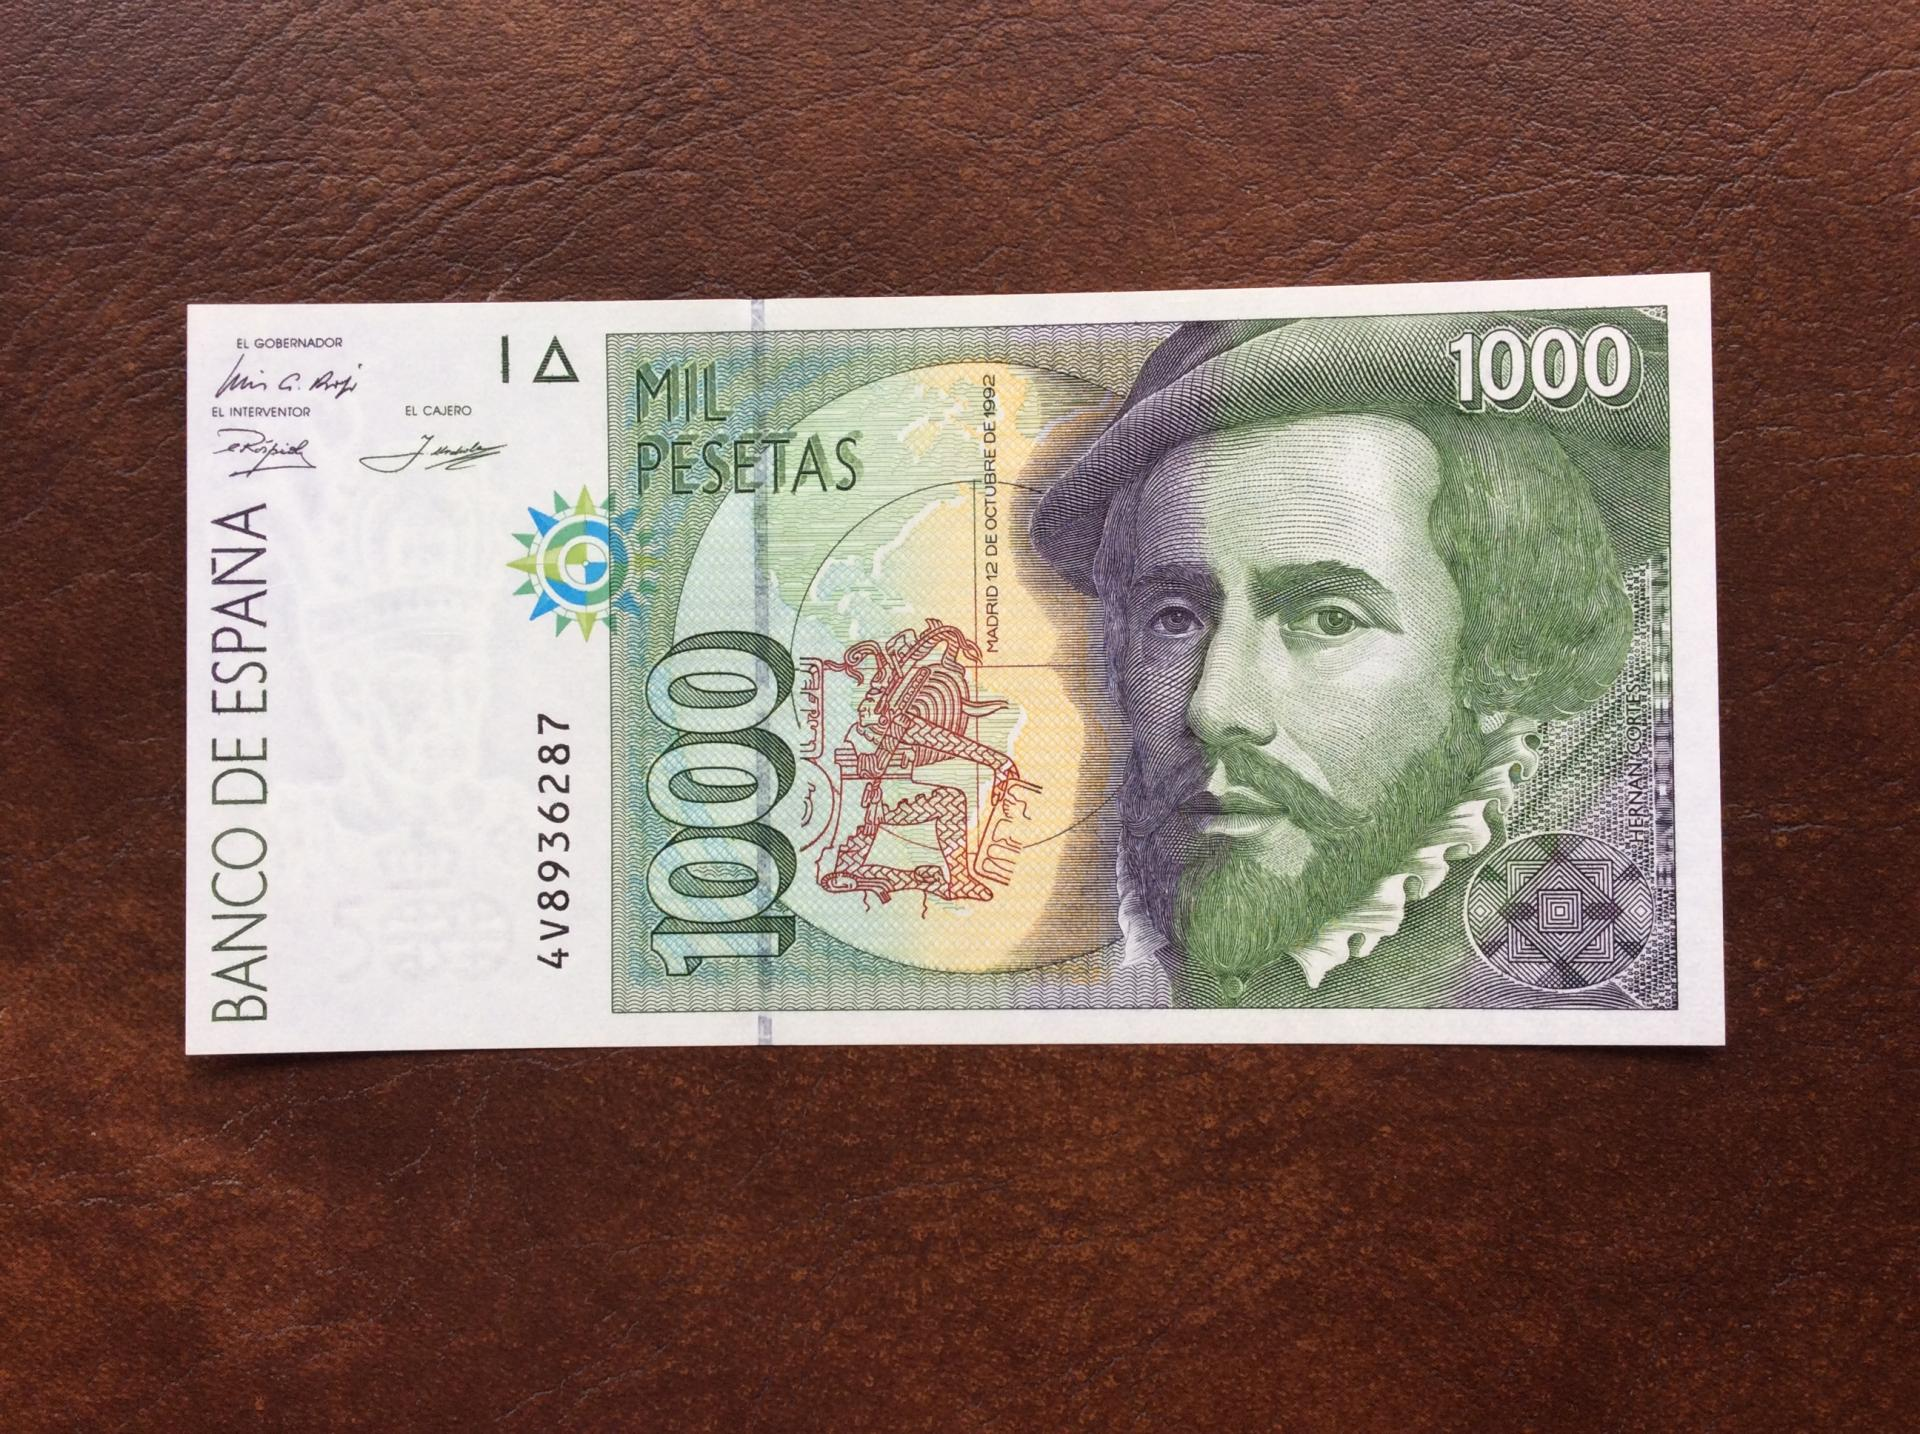 1000 PESETAS 1992 - SIN CIRCULAR